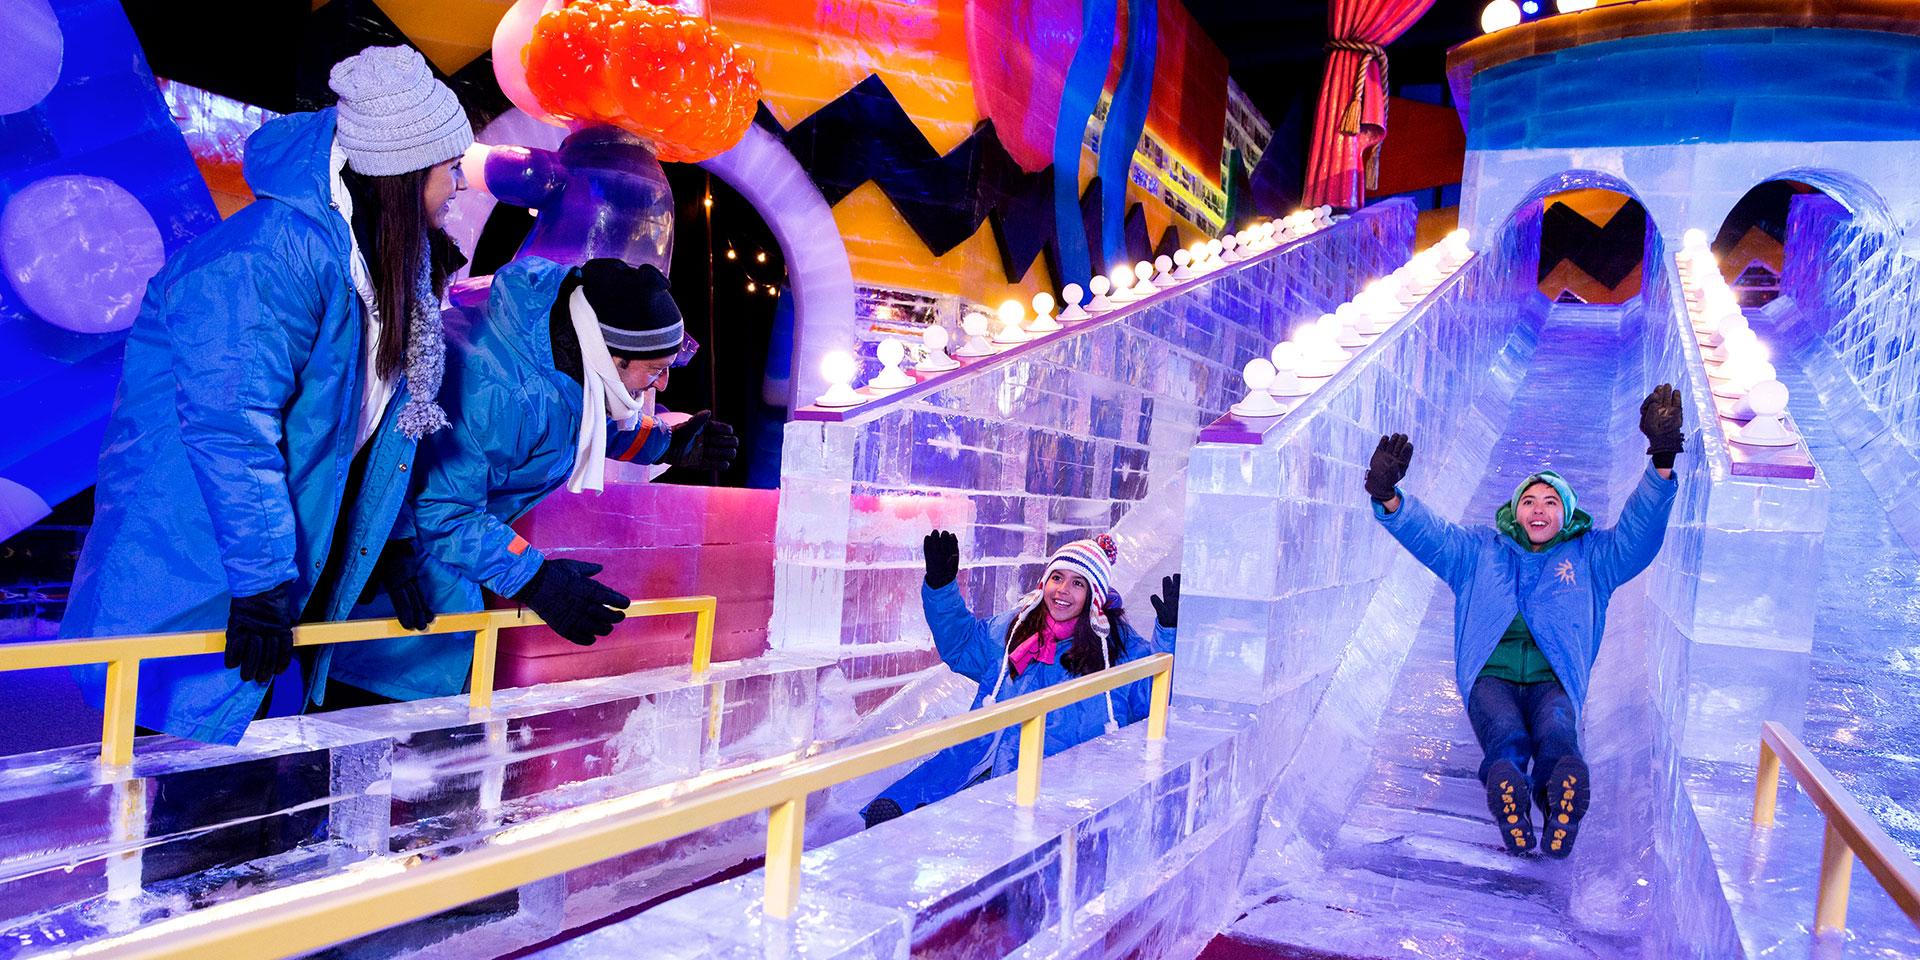 GaylordPalms ICE Slide2268 cScaletta